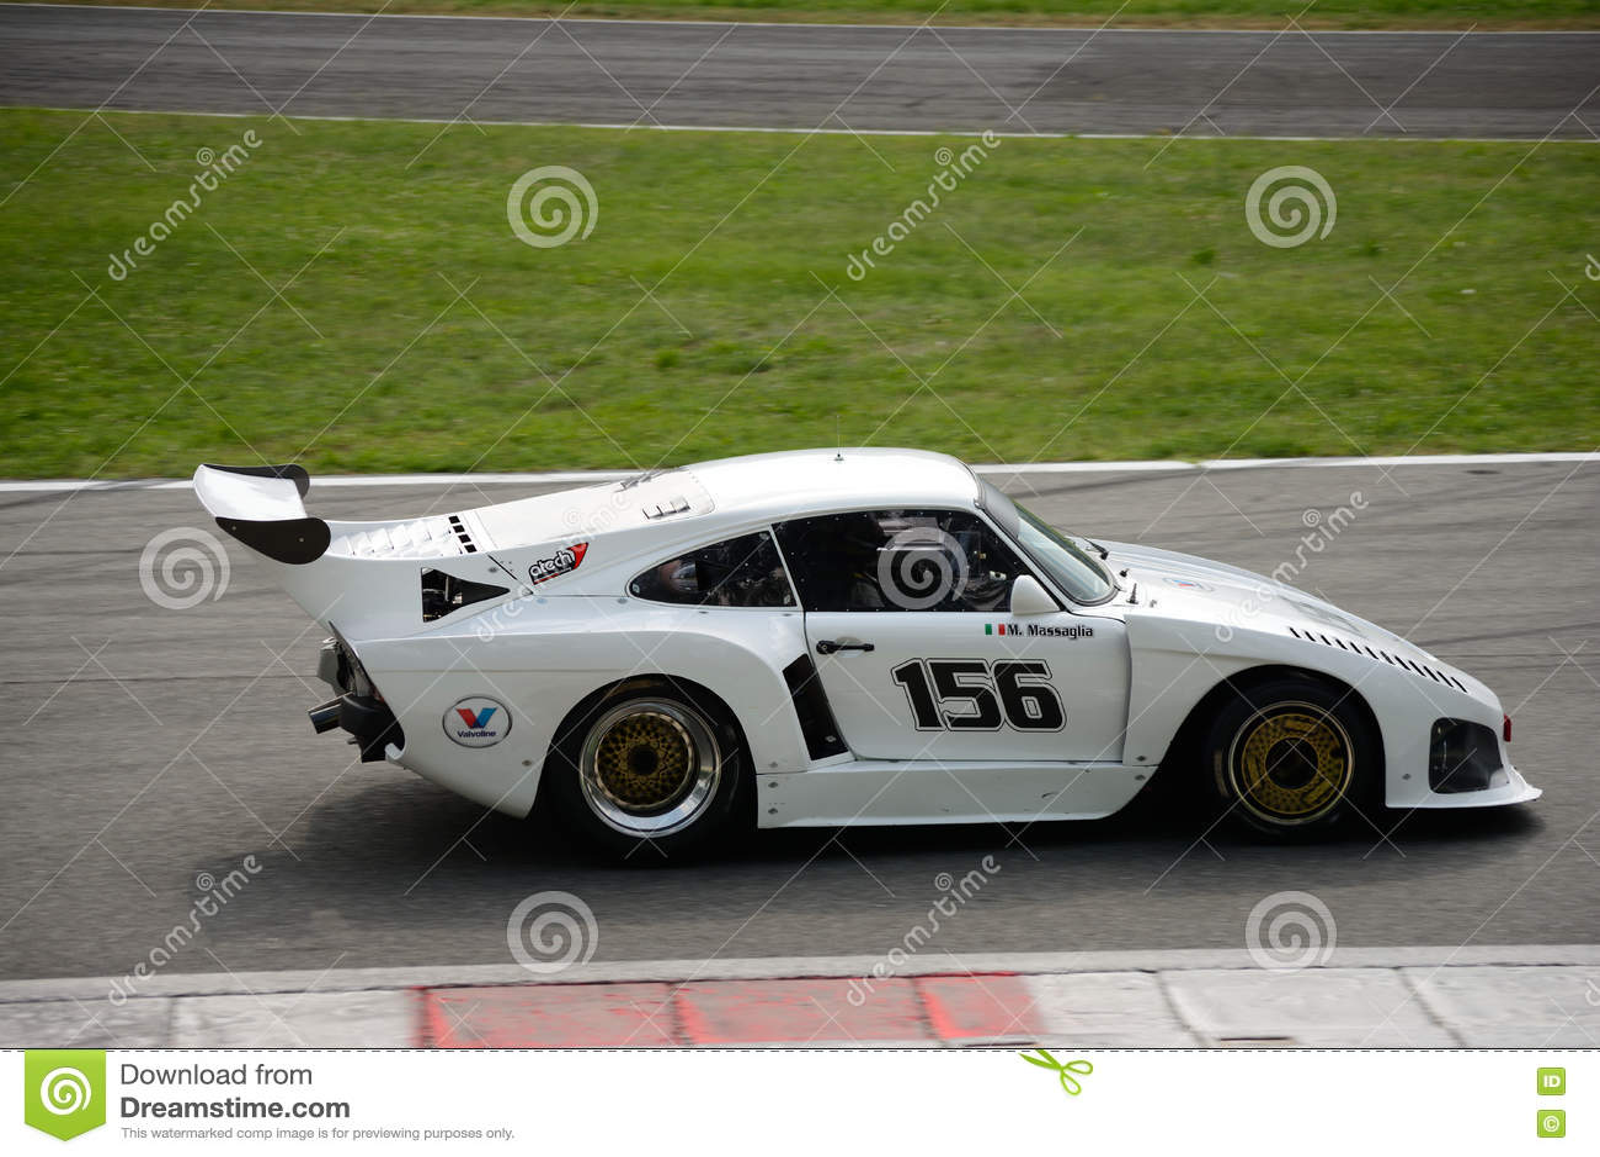 Turbocompressor De Mario Massaglia Porsche 935 Imagem De Stock Editorial Imagem De Mario Massaglia 75903089